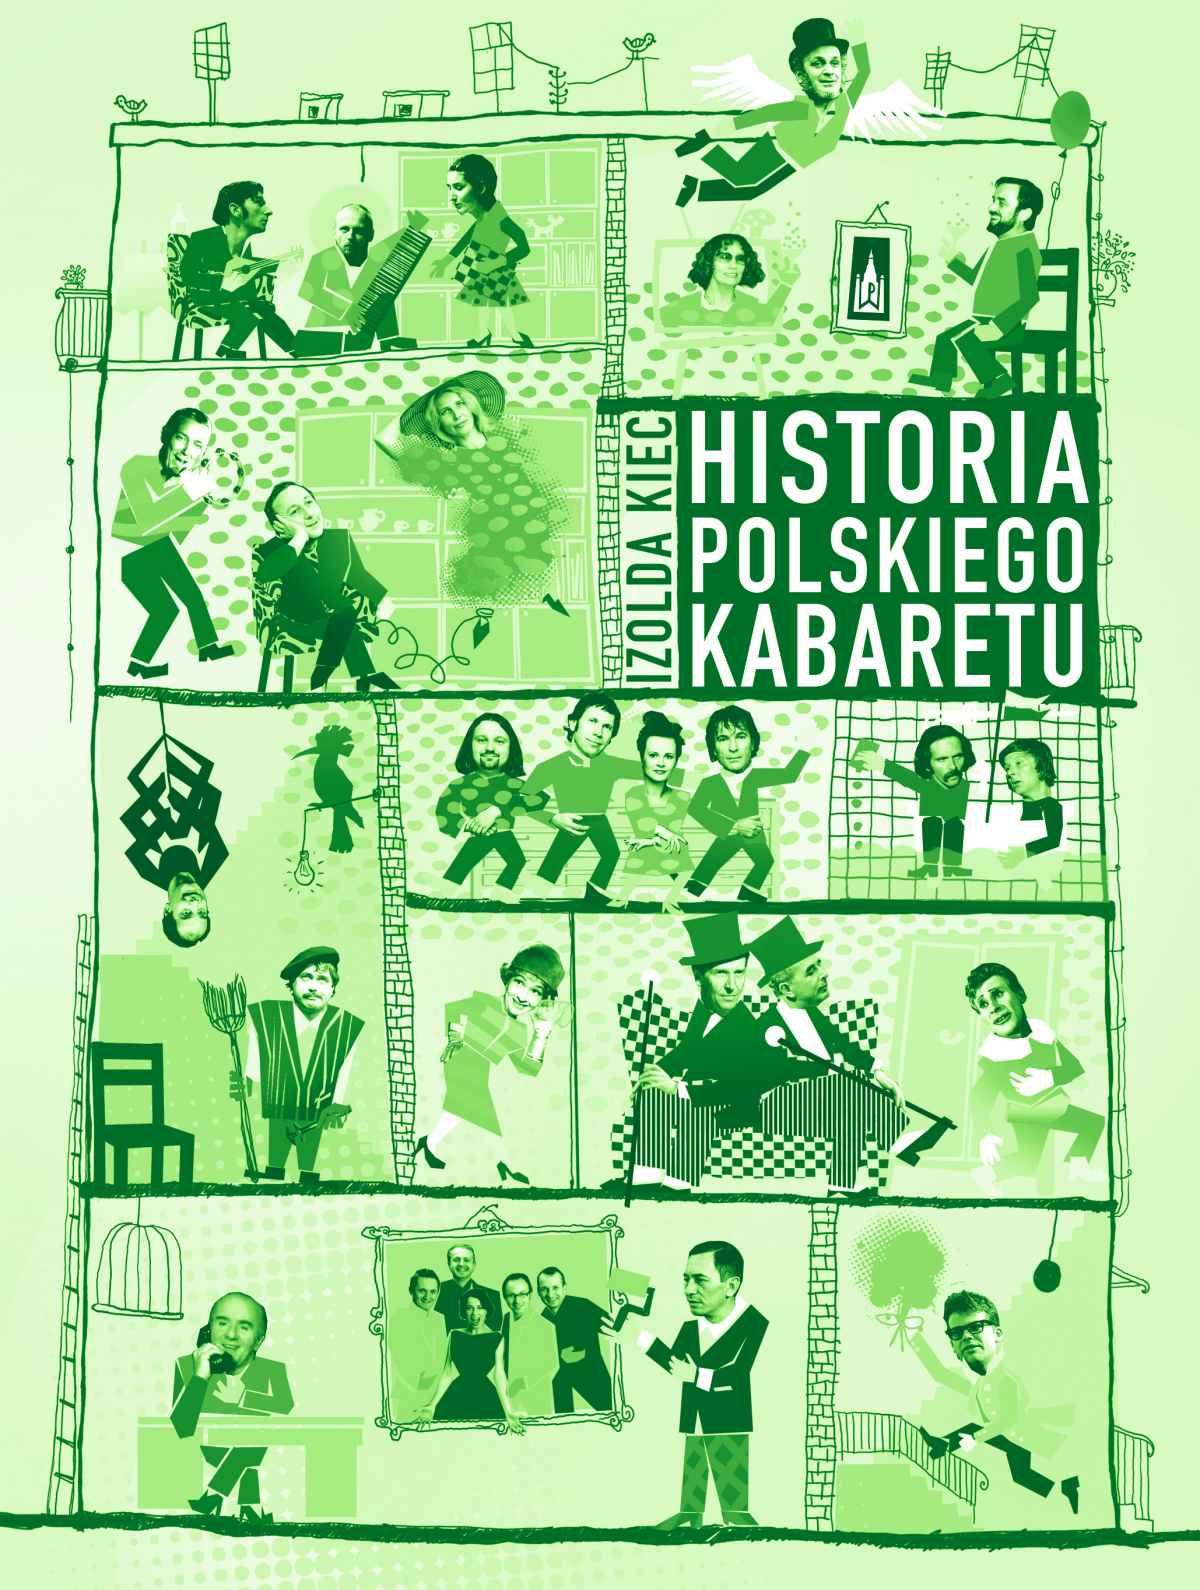 Historia polskiego kabaretu - Ebook (Książka na Kindle) do pobrania w formacie MOBI